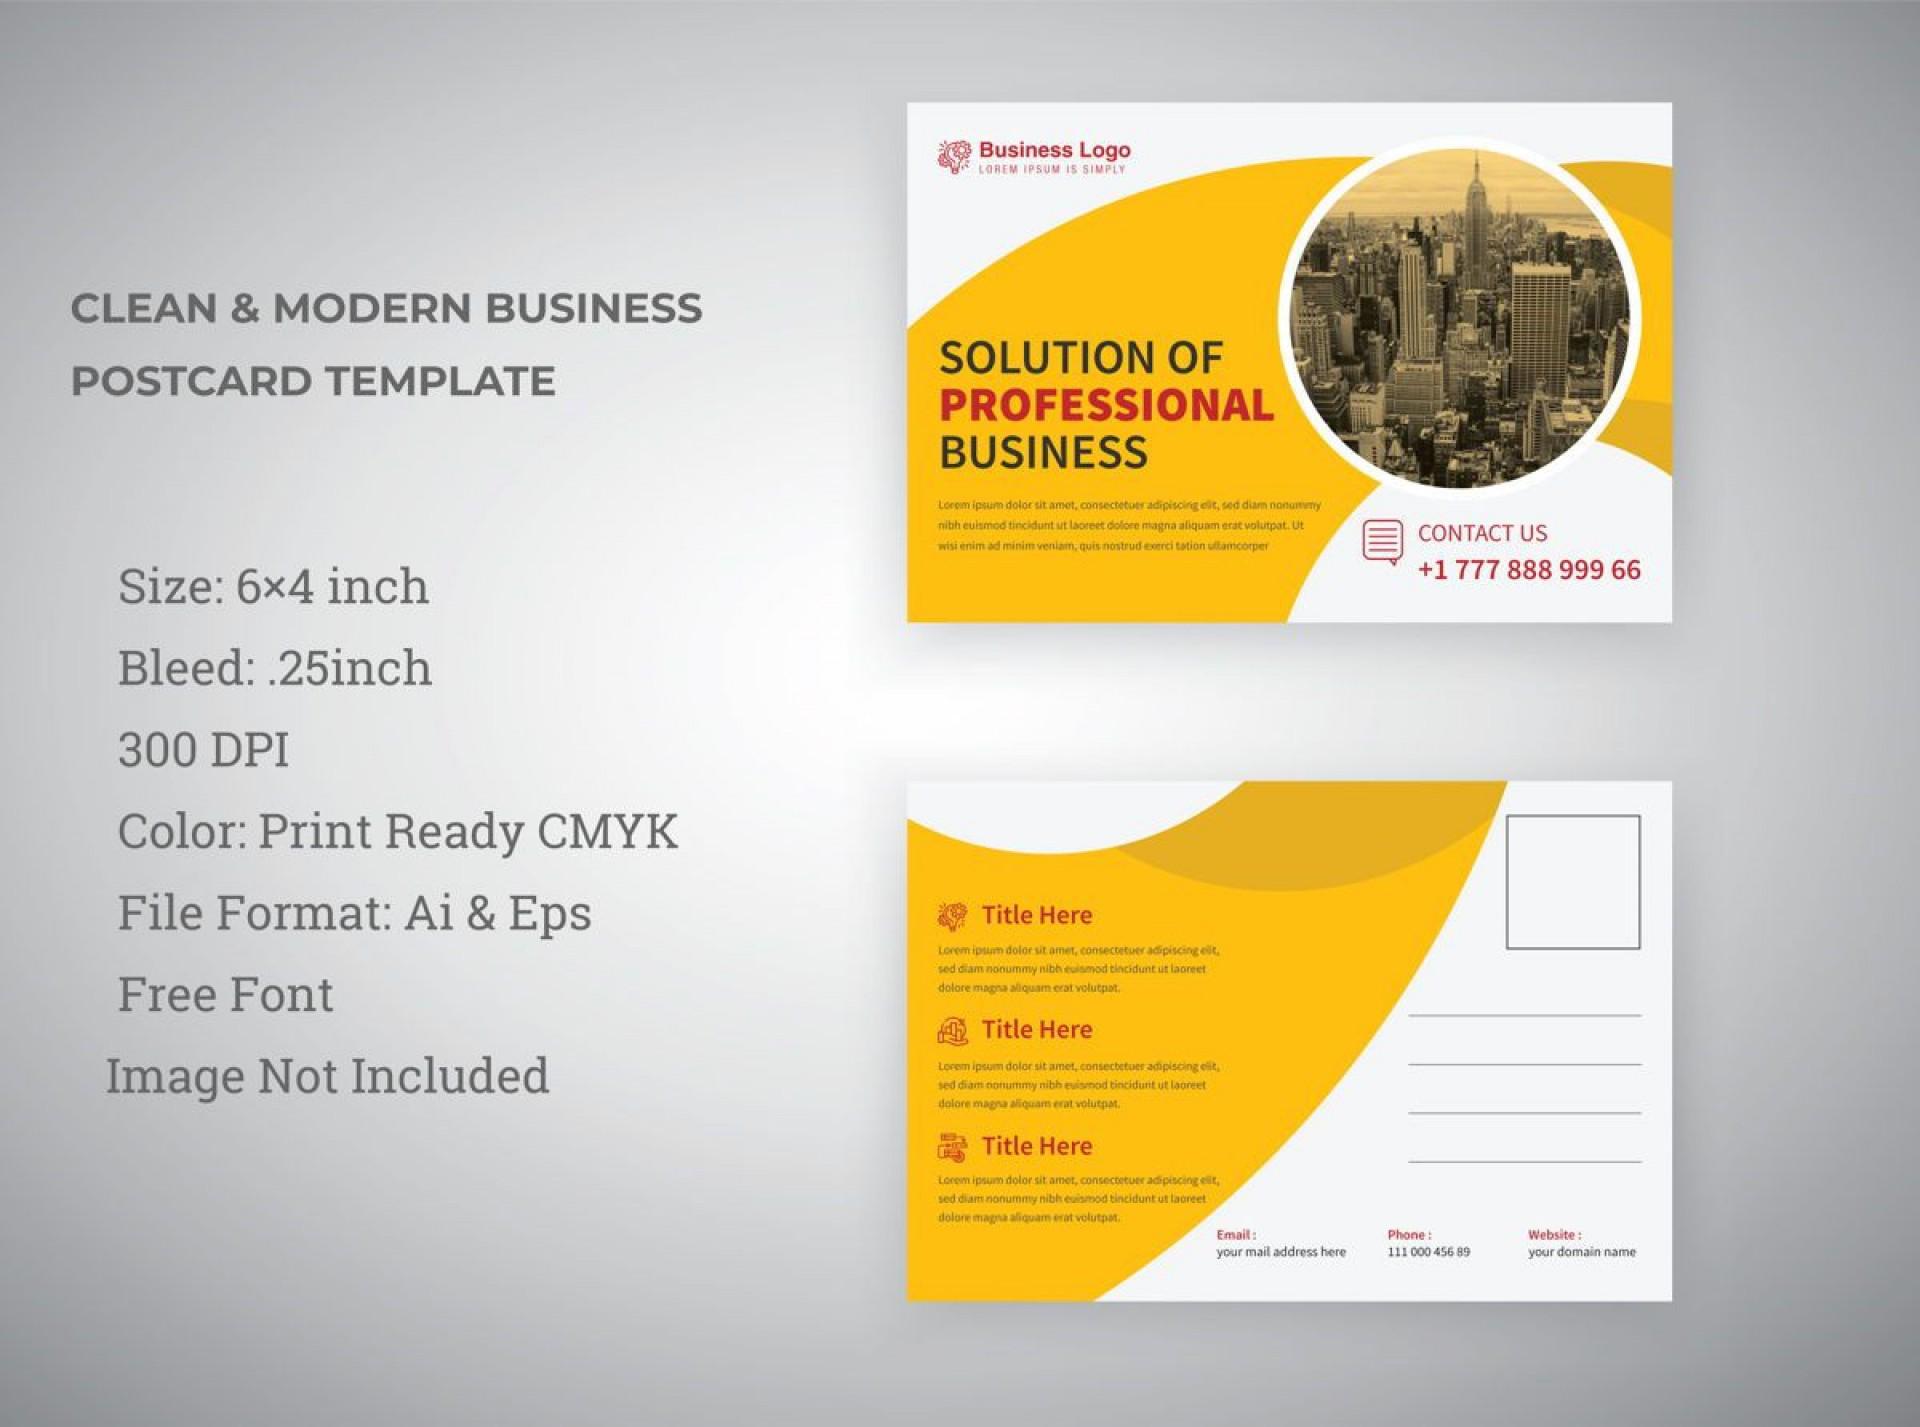 009 Unbelievable Busines Postcard Template Microsoft Word Concept 1920